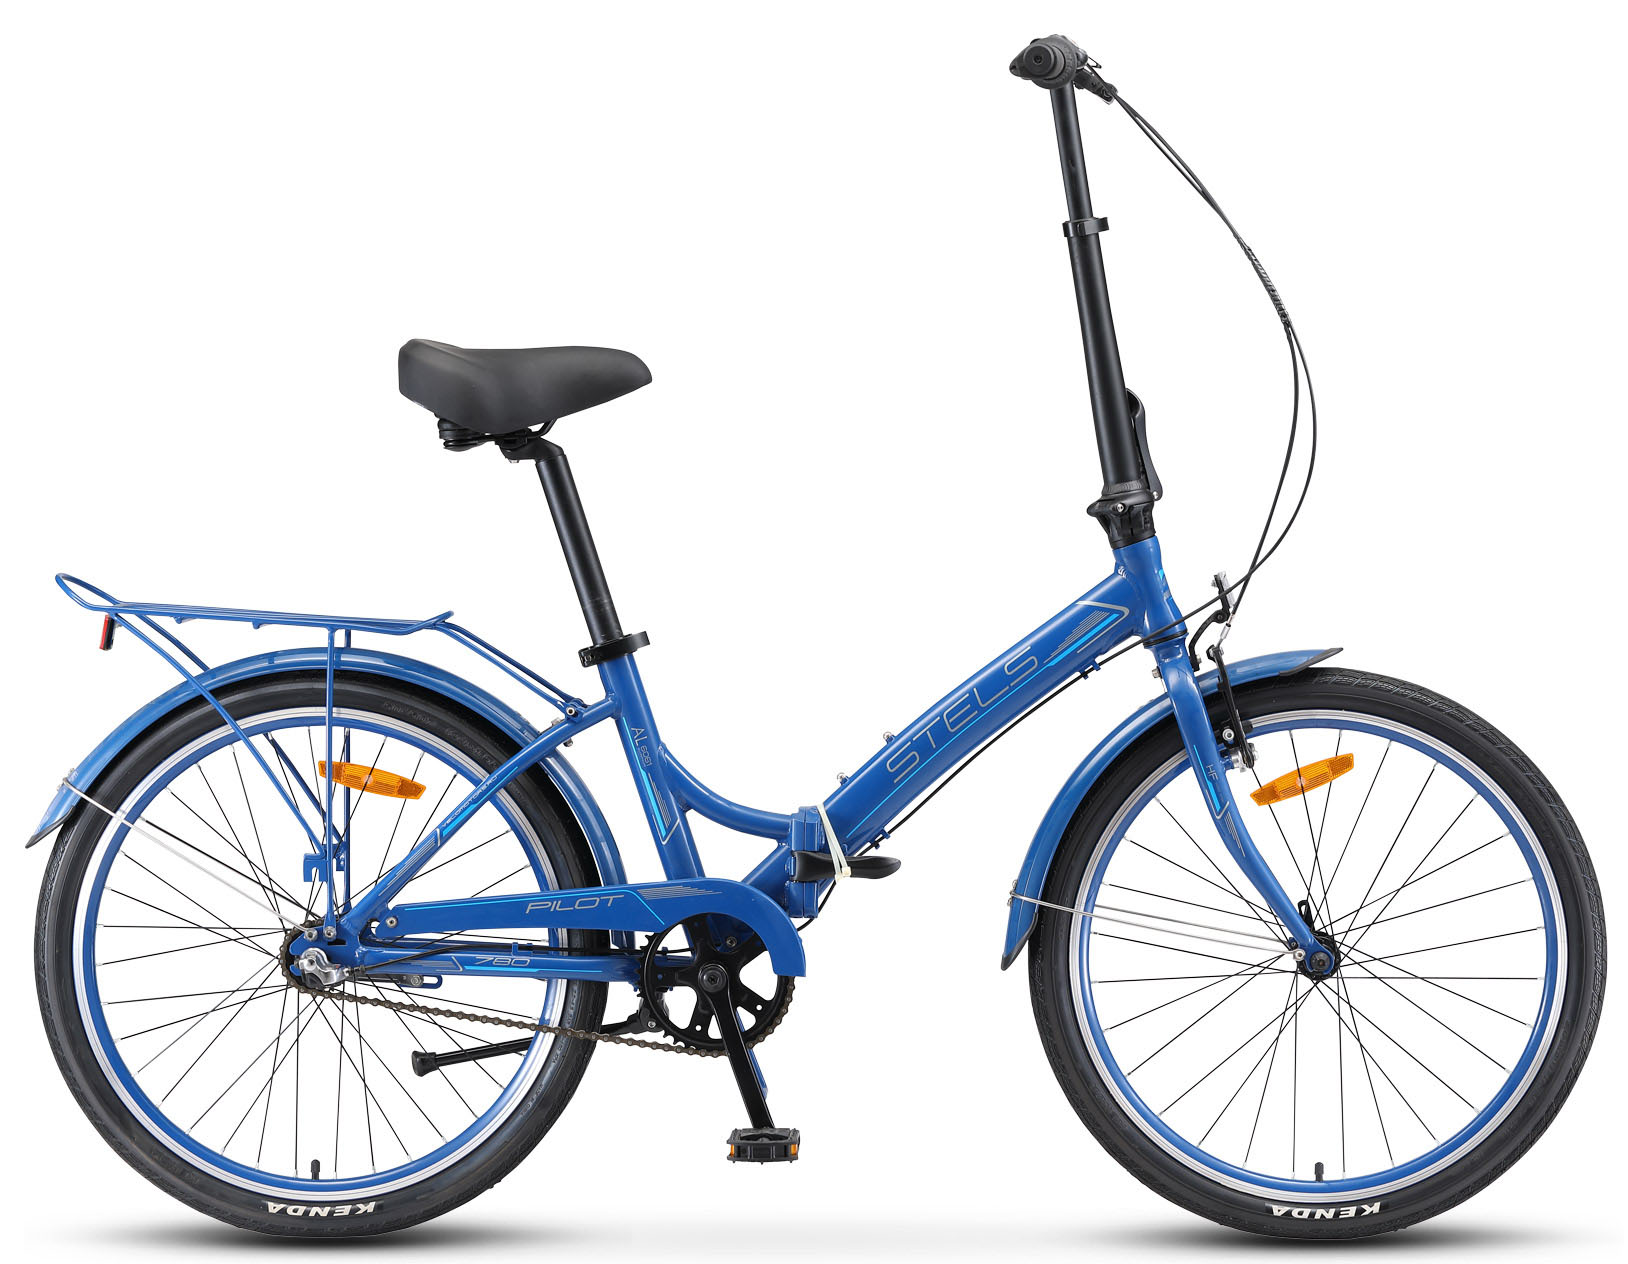 Велосипед Stels Pilot 780 24 V010 2019 велосипед stels pilot 750 2016